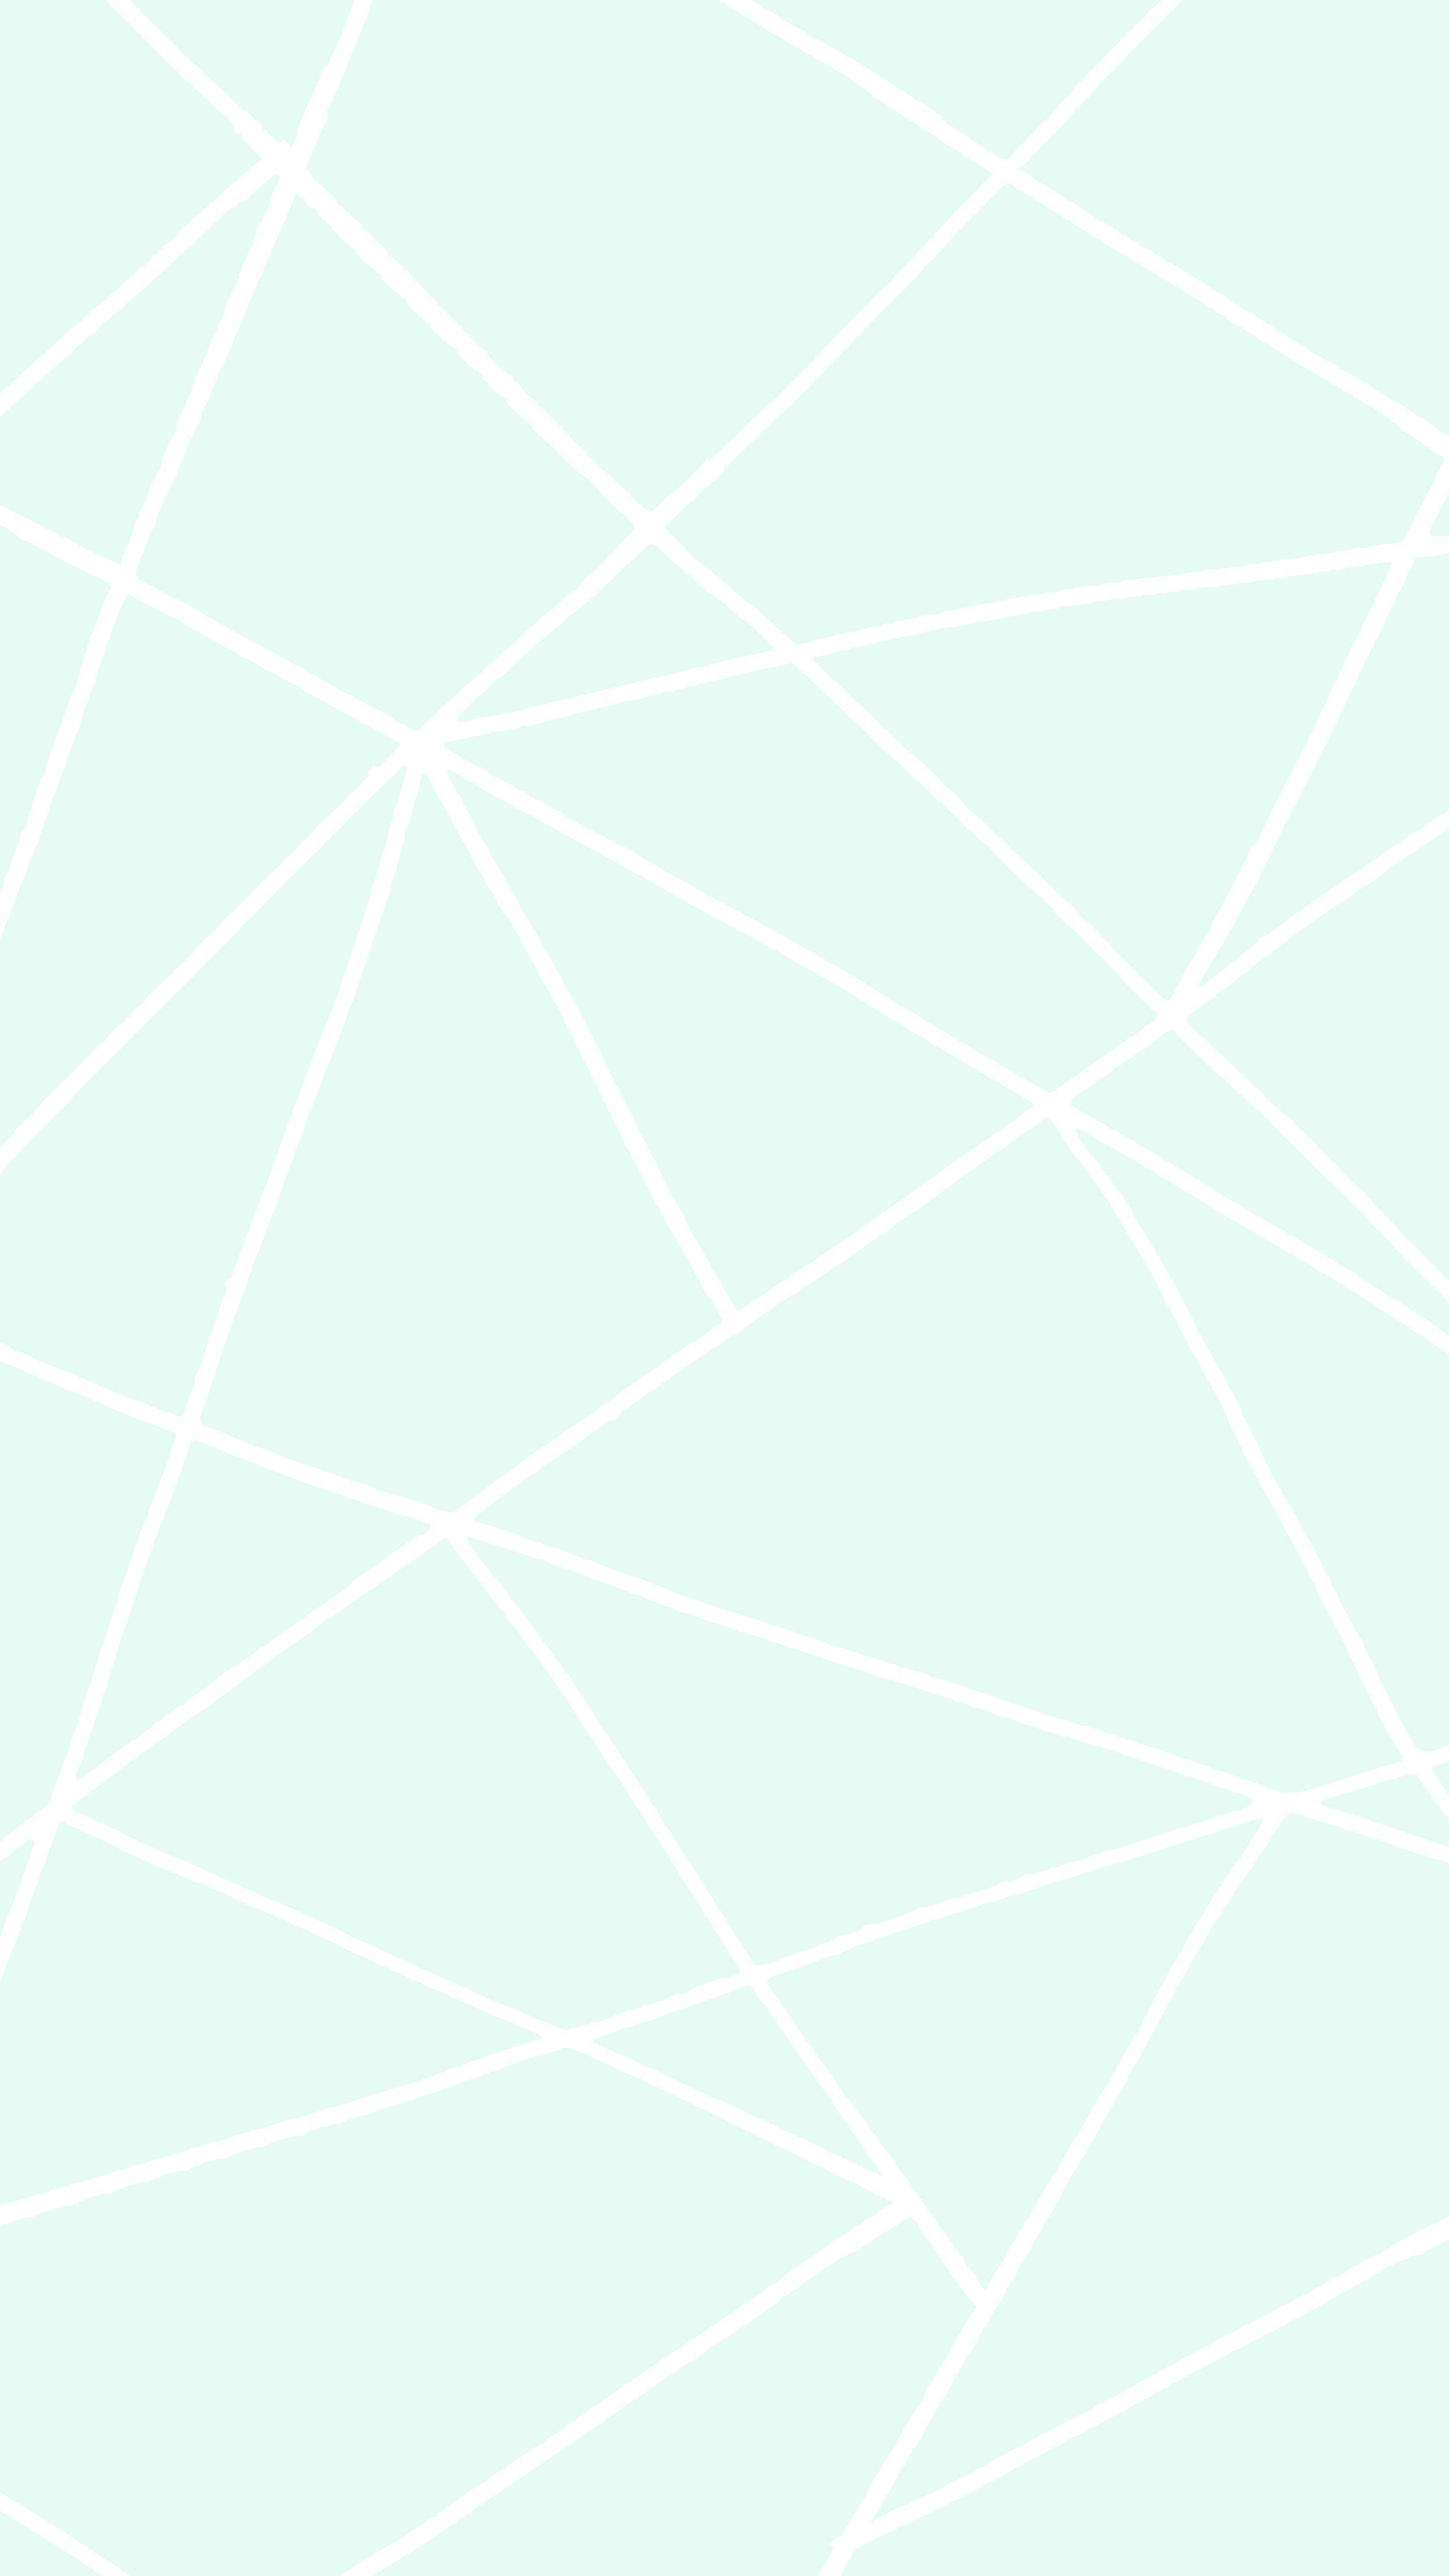 Www Lineacross Com Kertas Dinding Fotografi Abstrak Latar Belakang